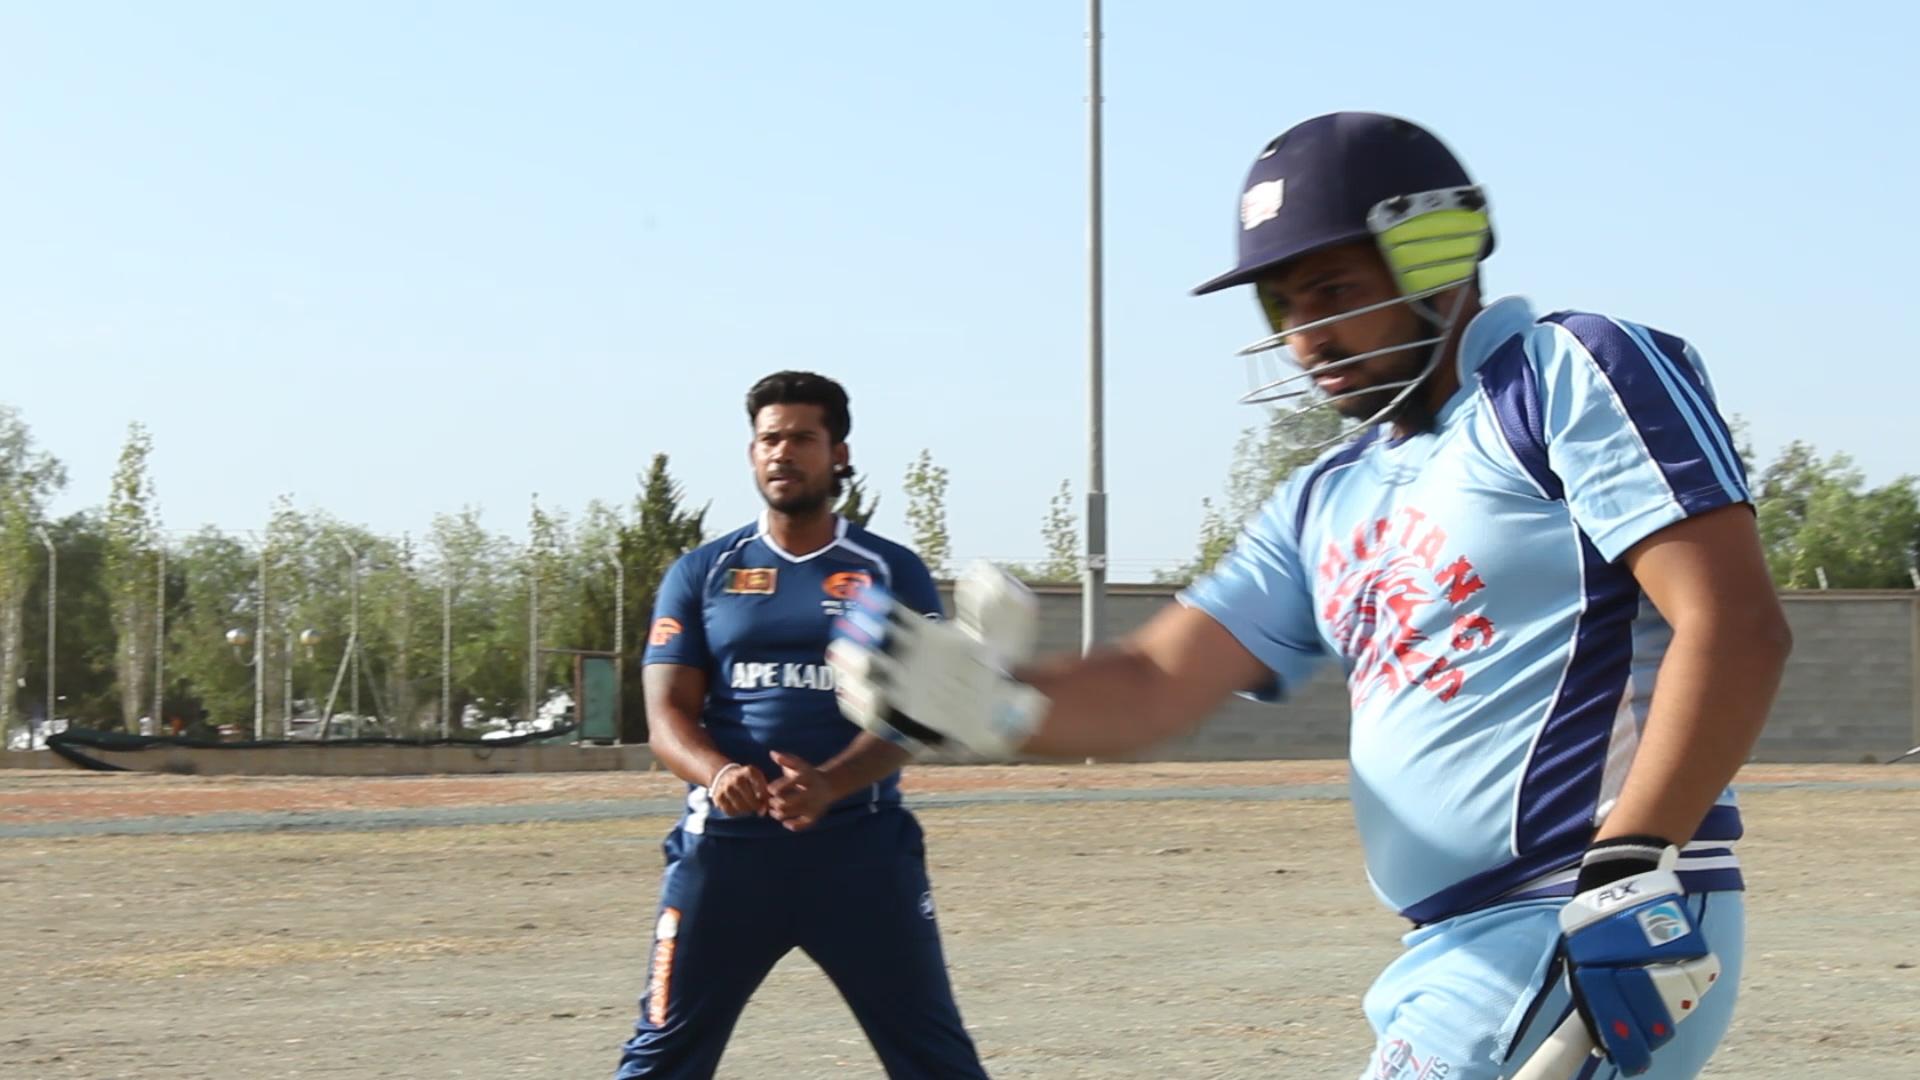 training-cricket-championship-rushes-01_13_04_15-still047